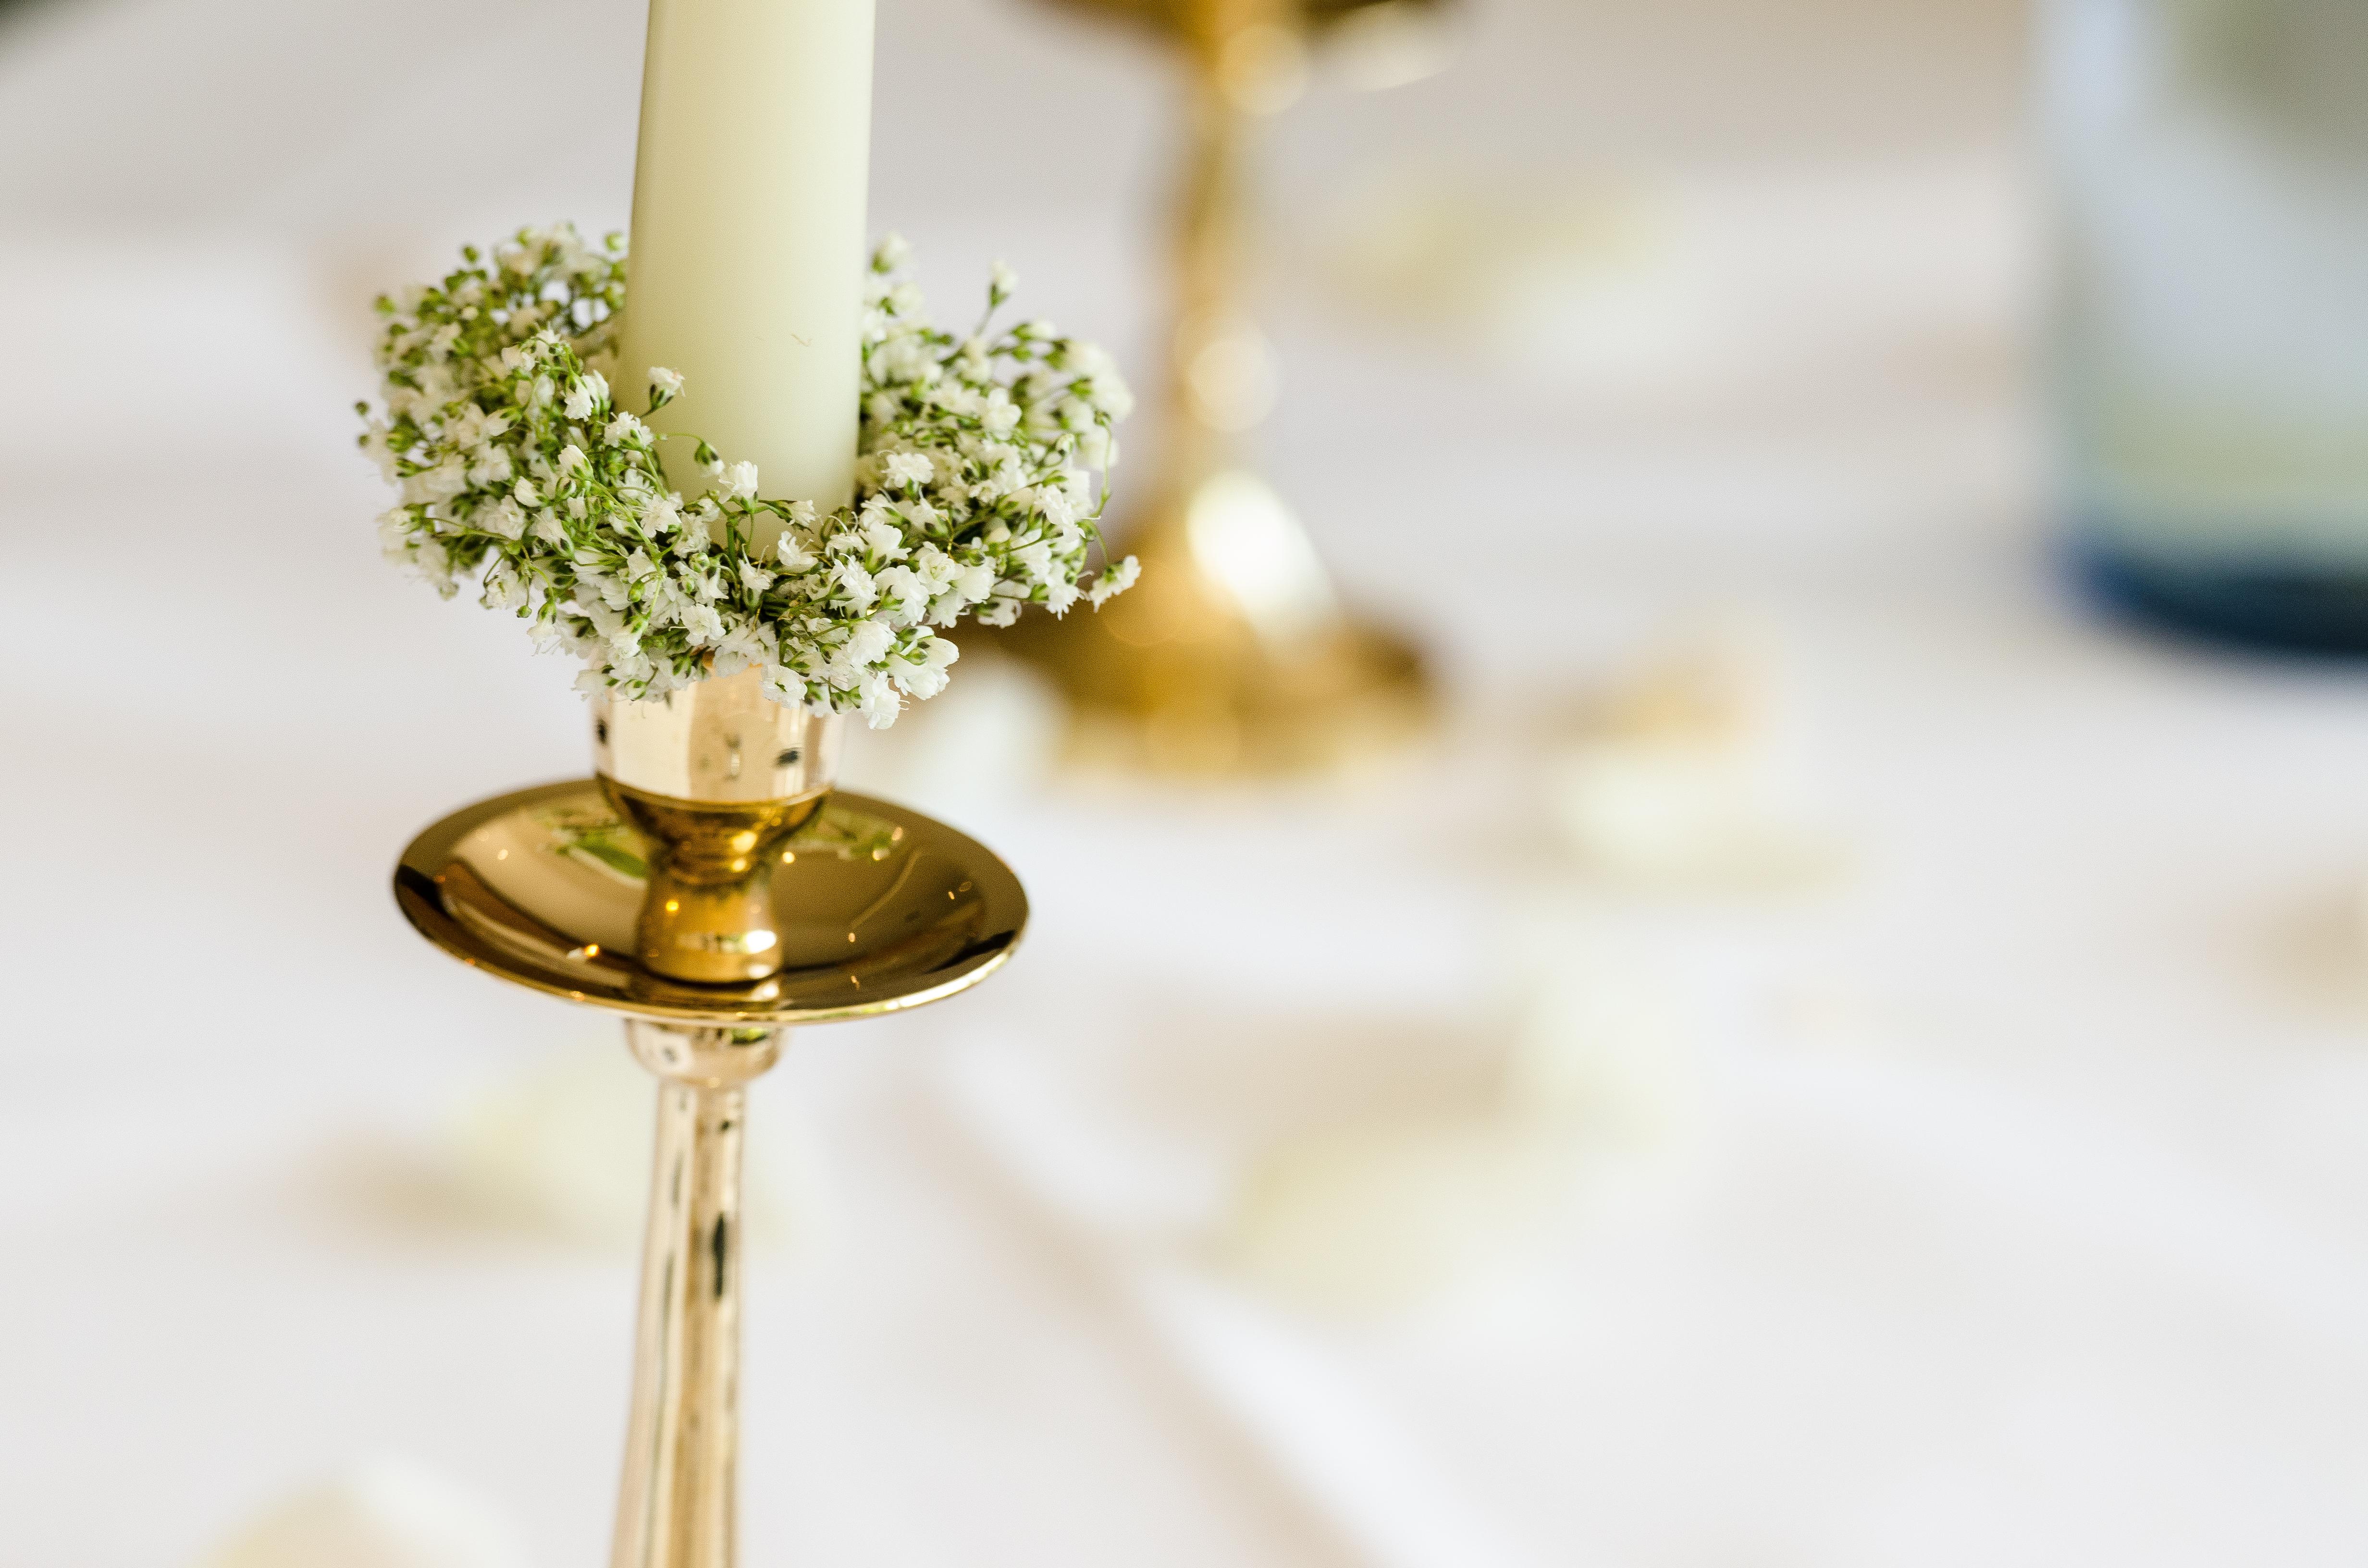 Kerzenständer Verleih